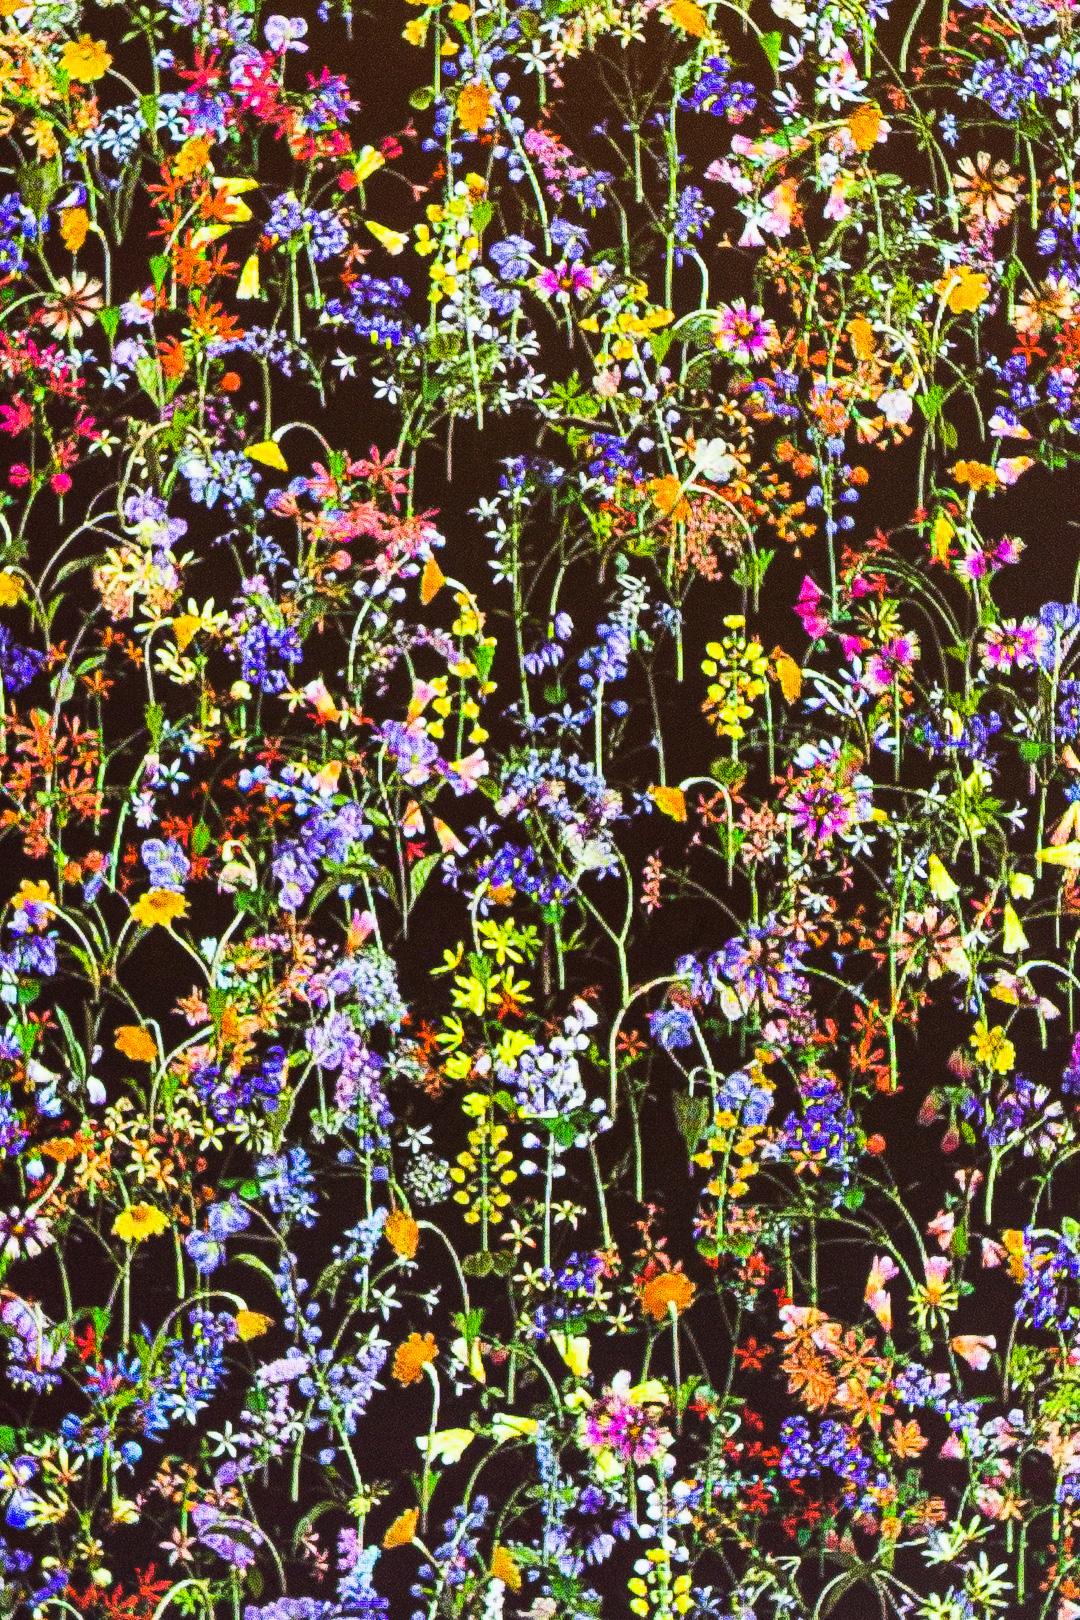 Digital Poisonous Flowers Artwork at Saffron Fields Vineyard